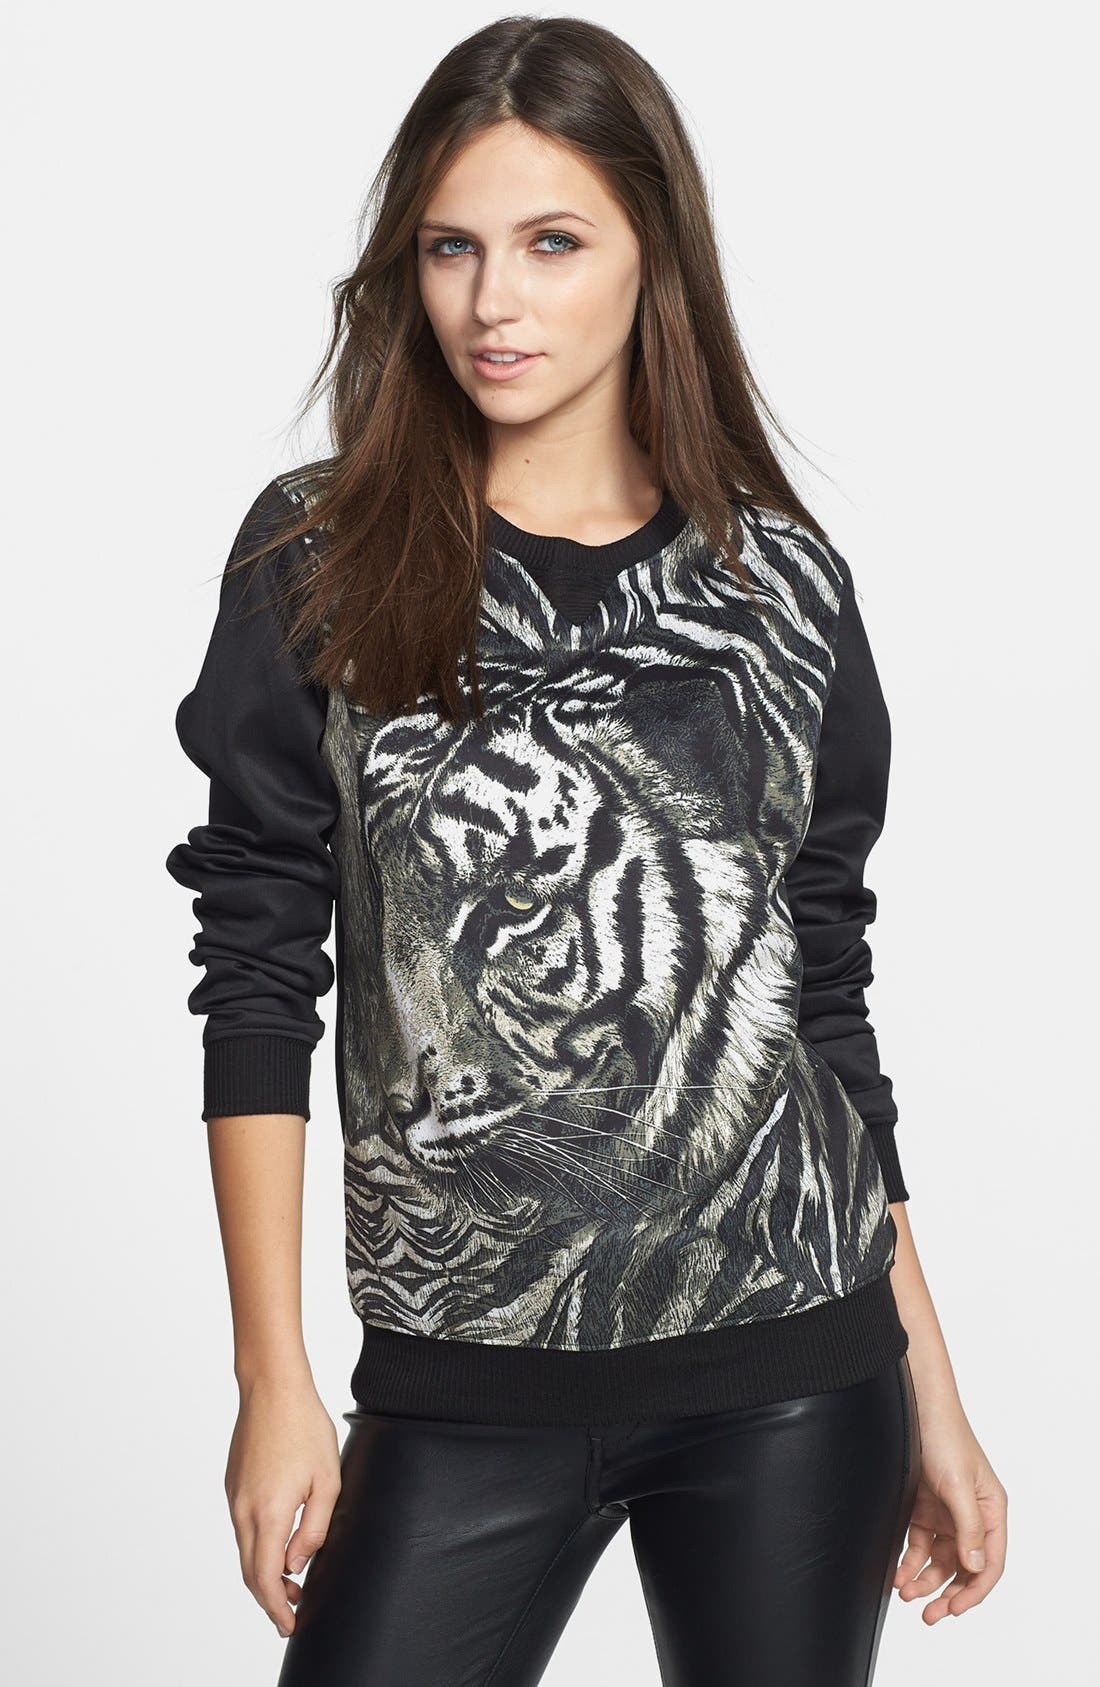 Alternate Image 1 Selected - WAYF Graphic Print Neoprene Sweatshirt